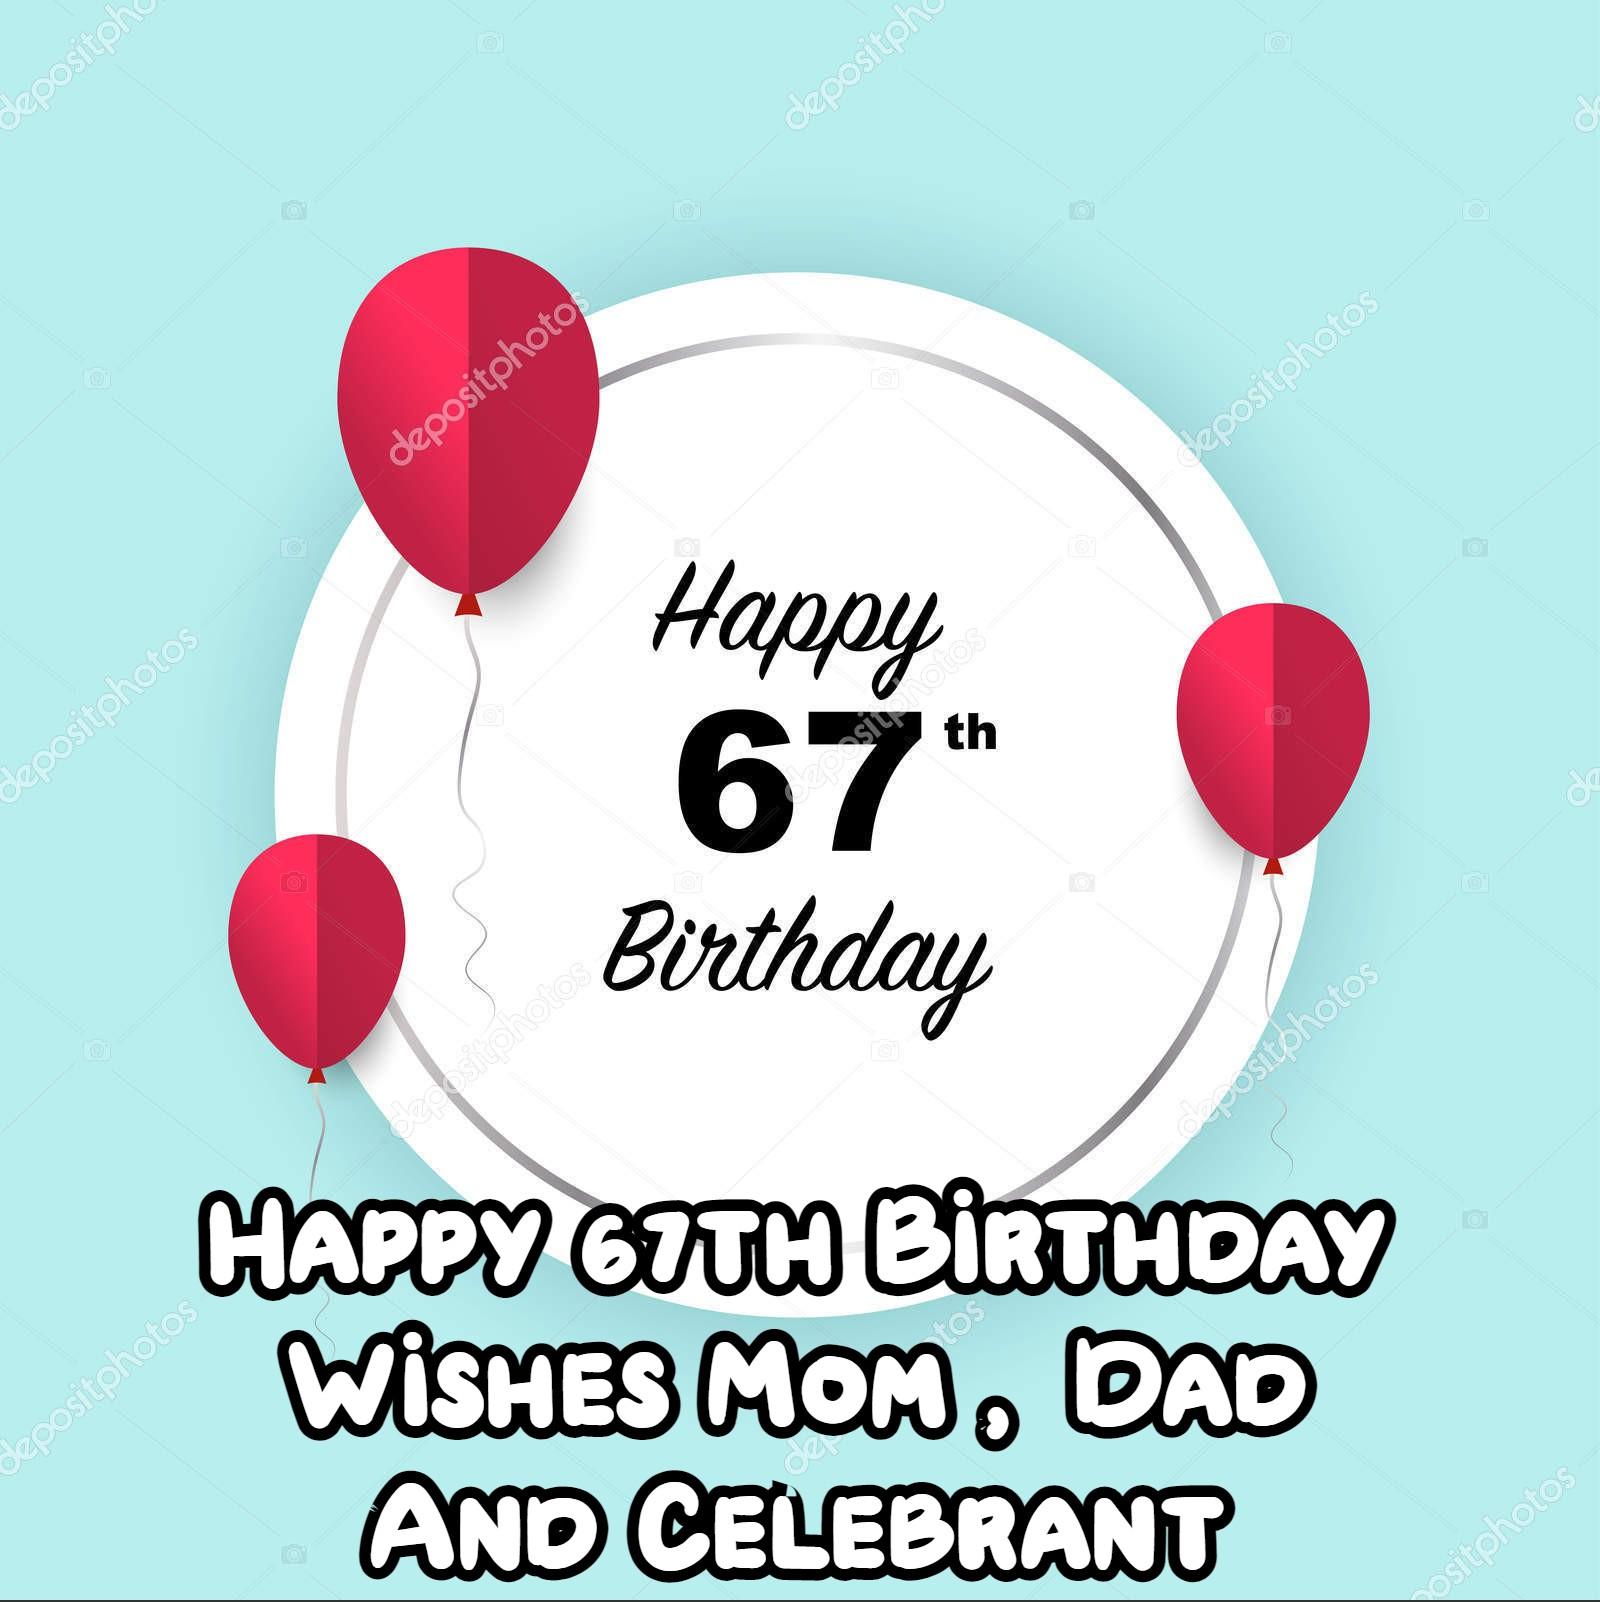 Happy 67th Birthday